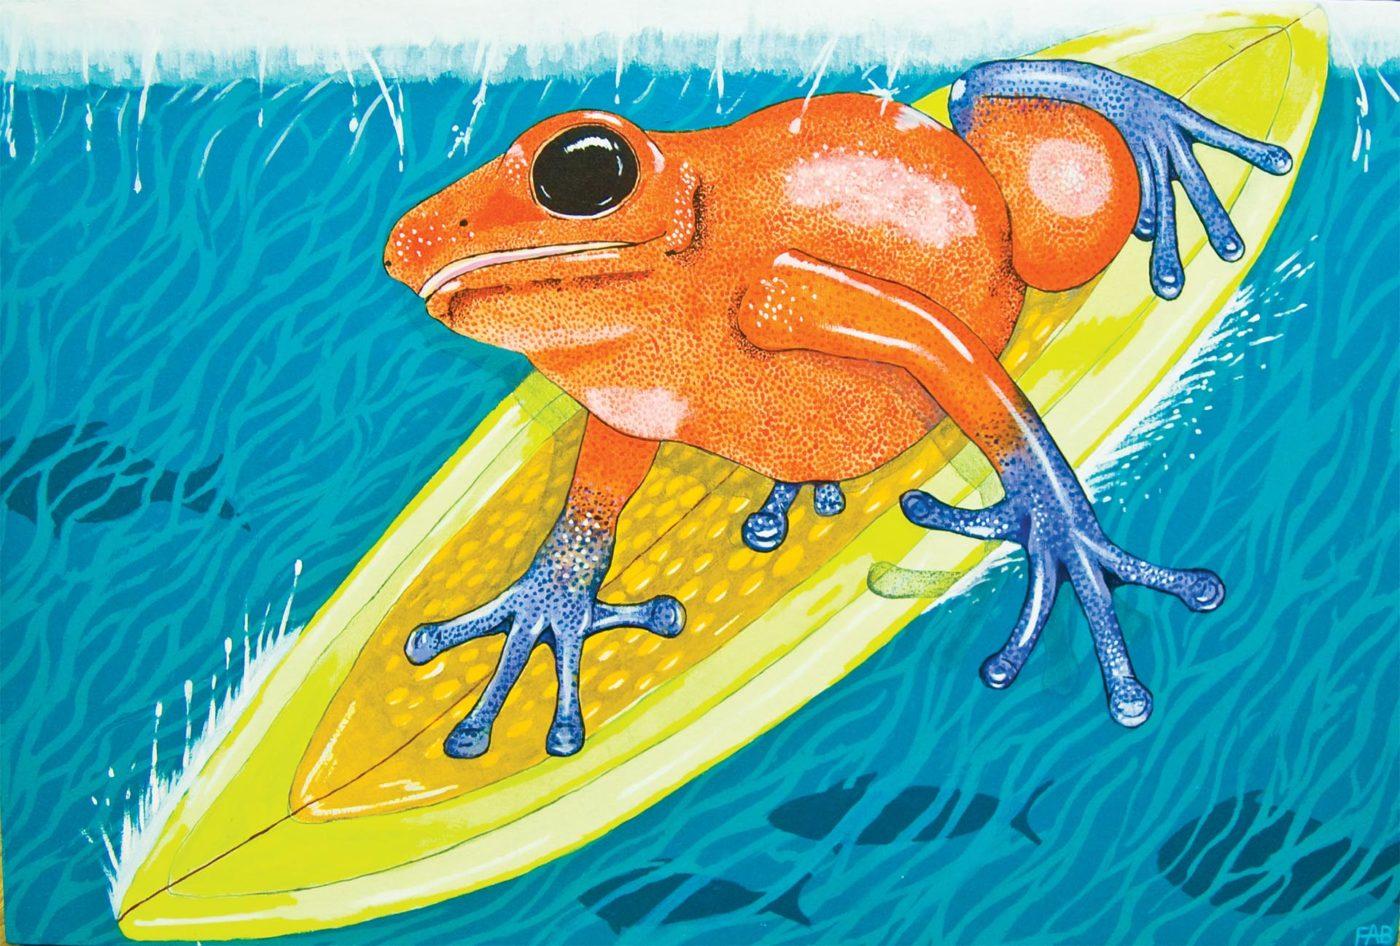 Frank Beifus Surfing Frog